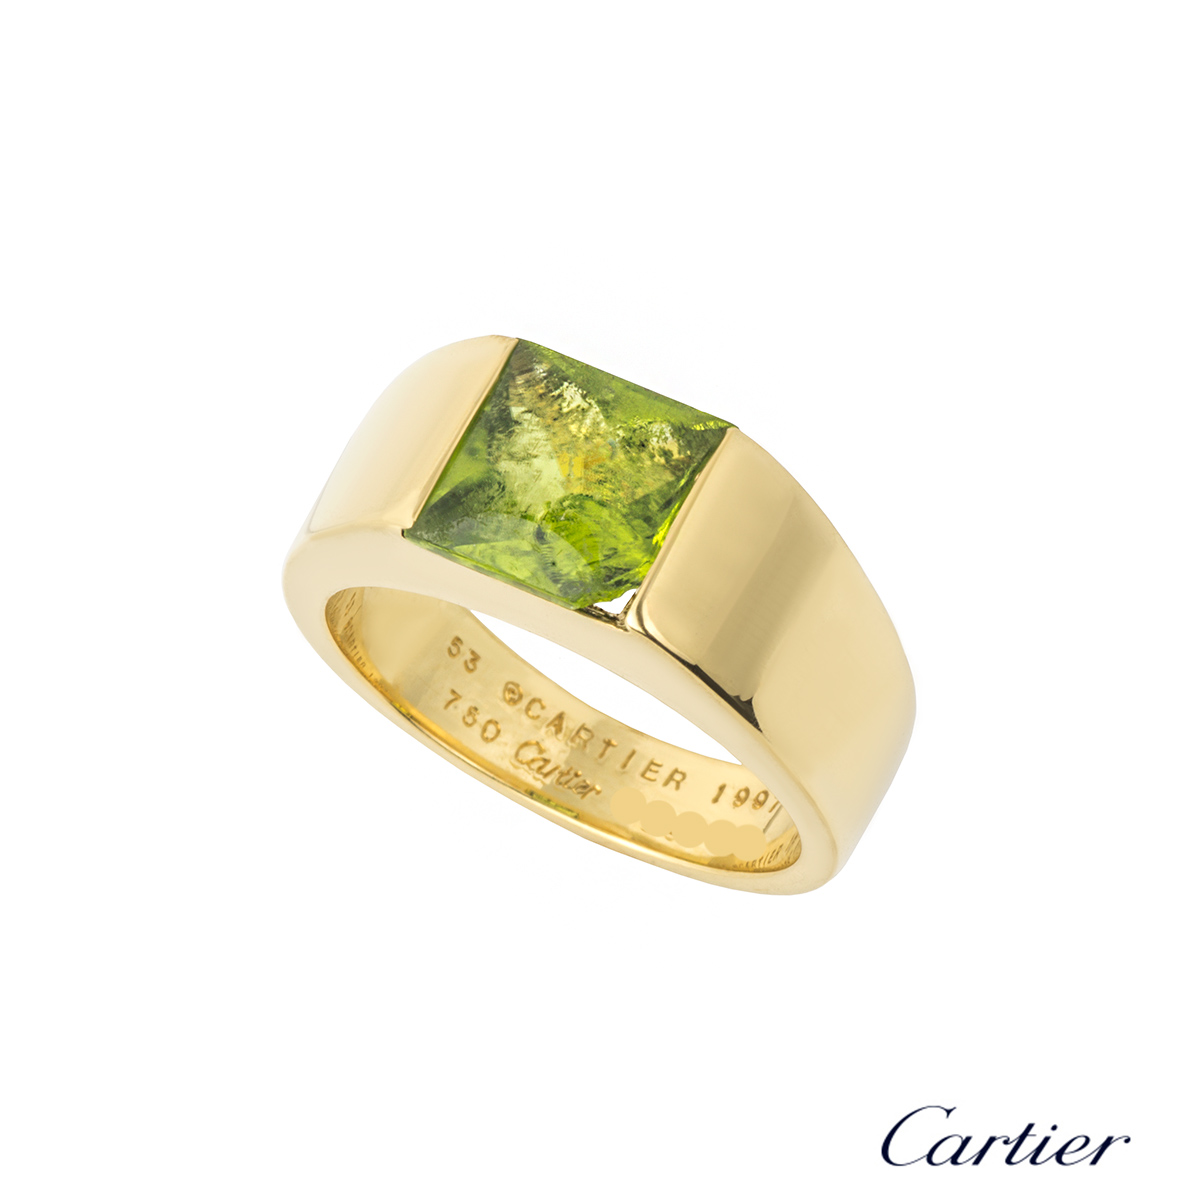 Cartier 18k Yellow Gold Peridot Tank Ring